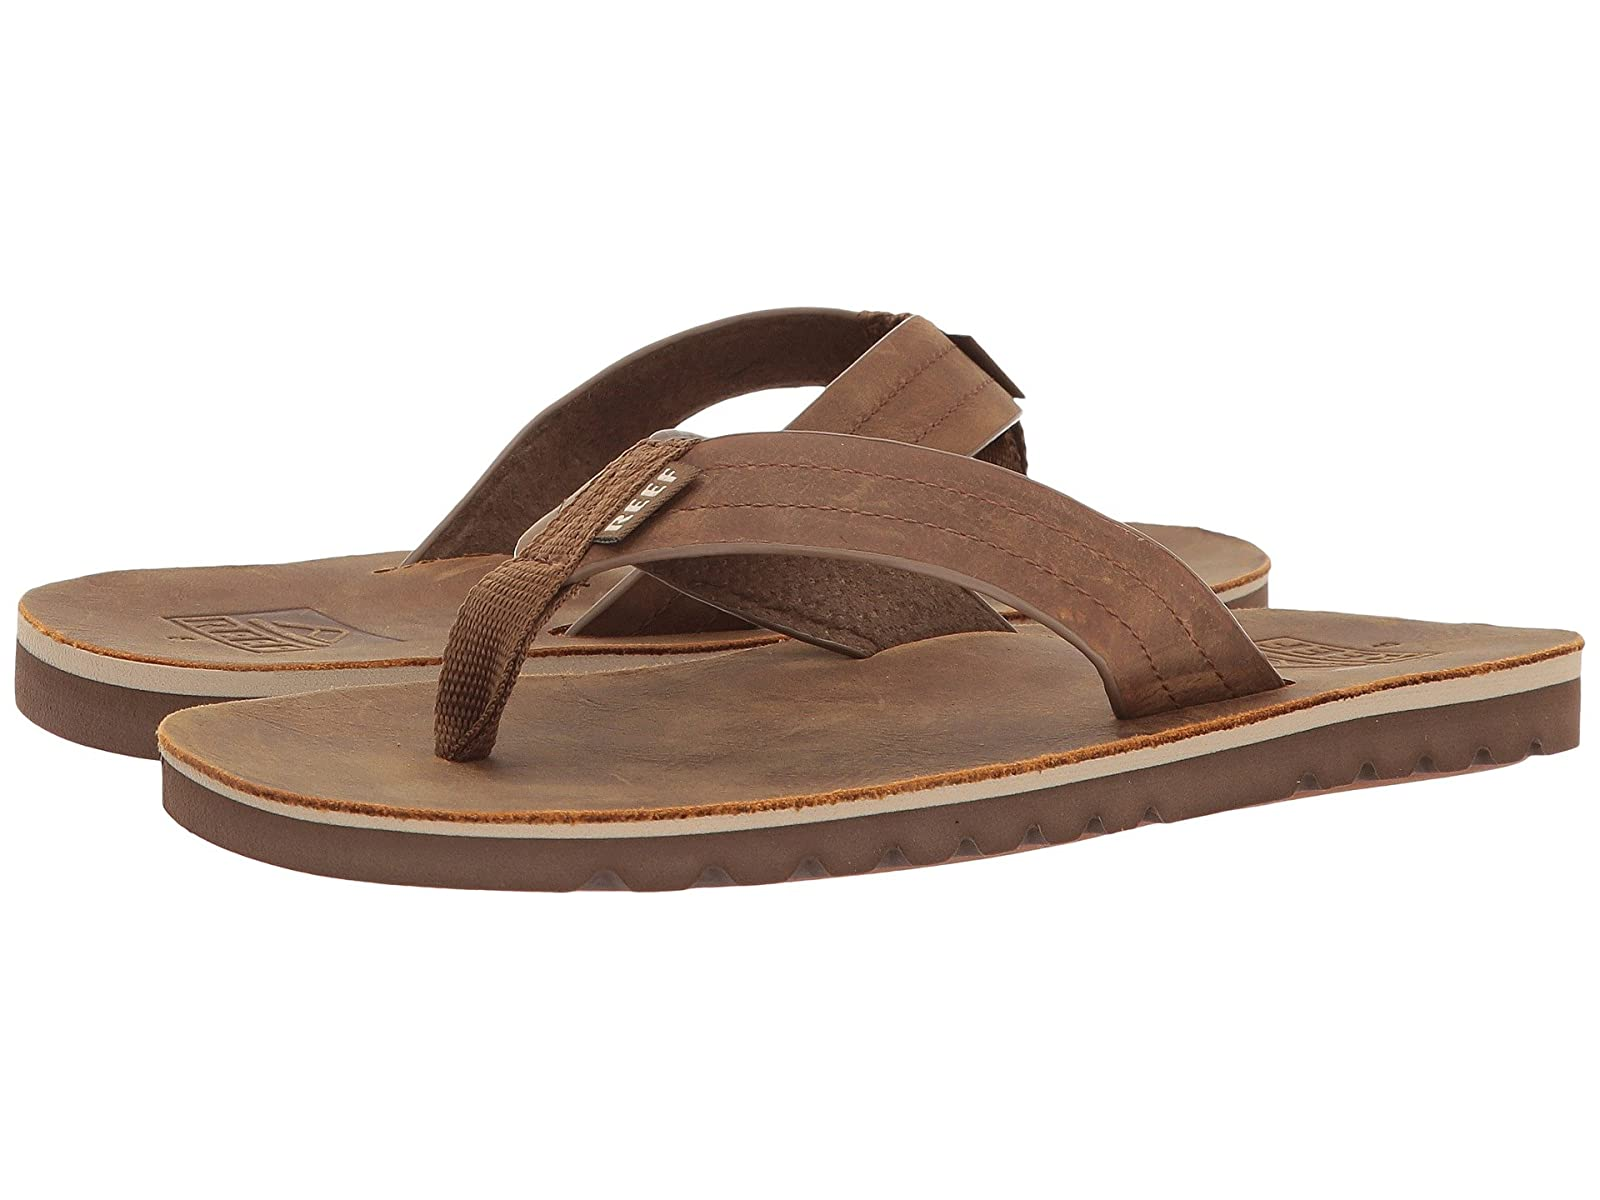 Reef Voyage LEAtmospheric grades have affordable shoes